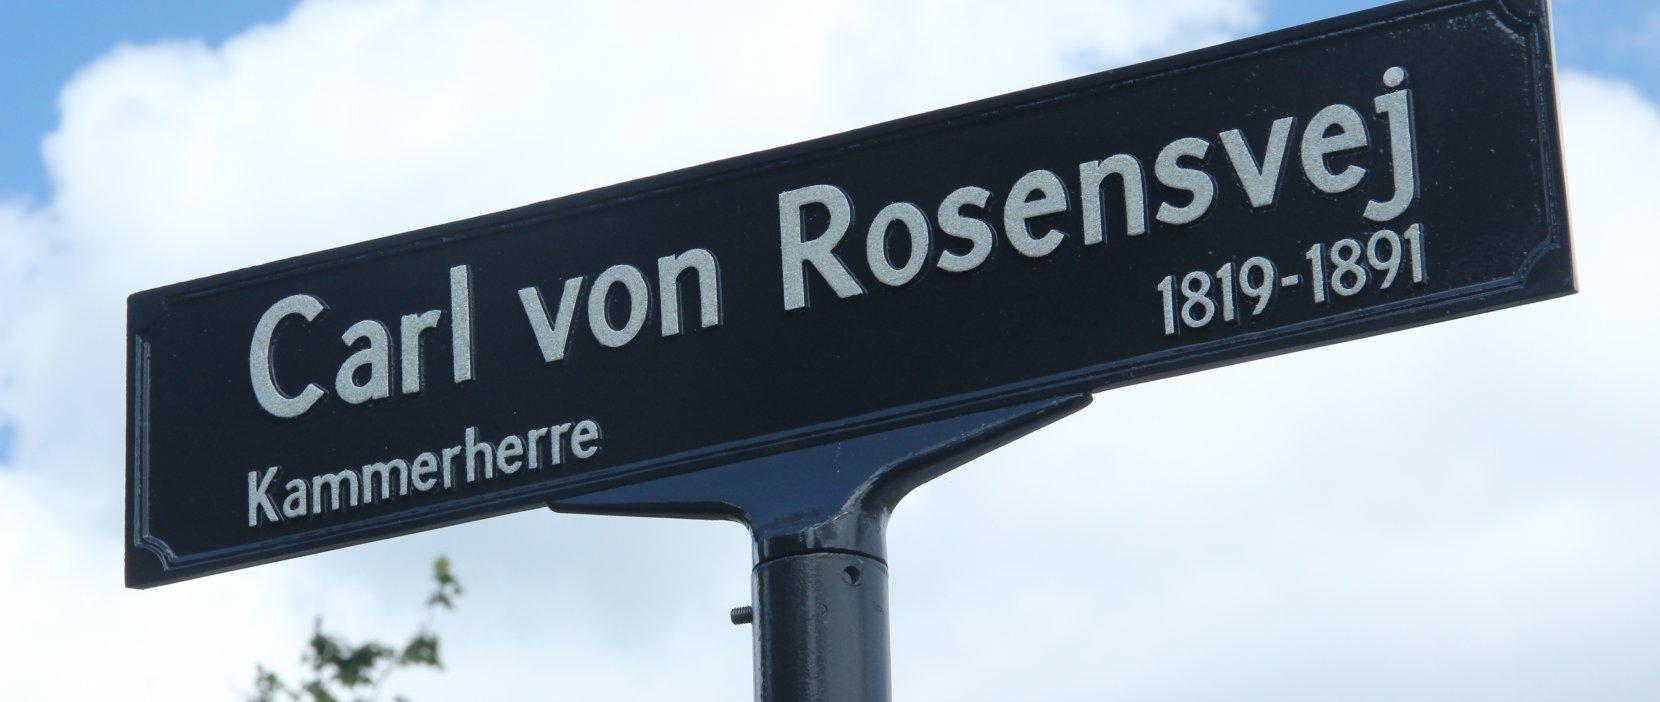 skilt med Carl von Rosensvej